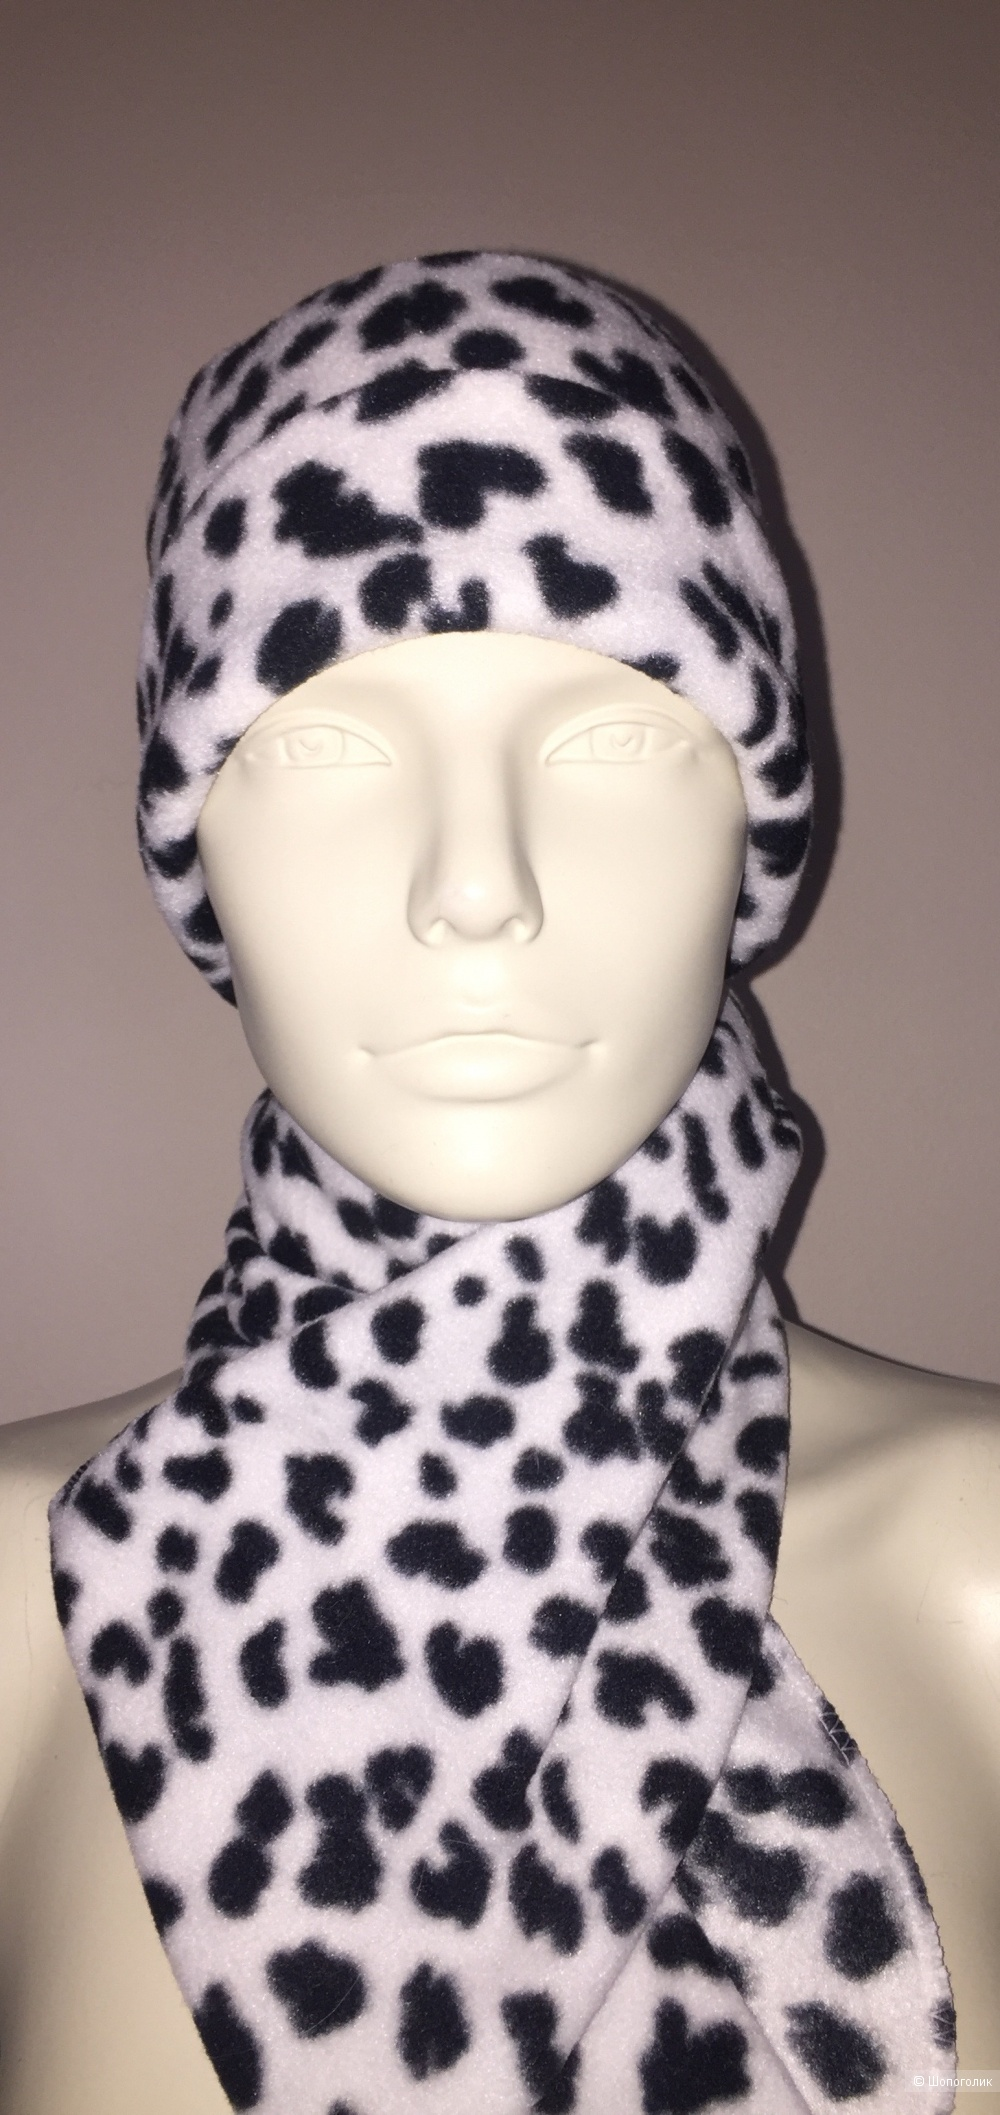 Комплект no name: шапка, шарф, перчатки размер 56